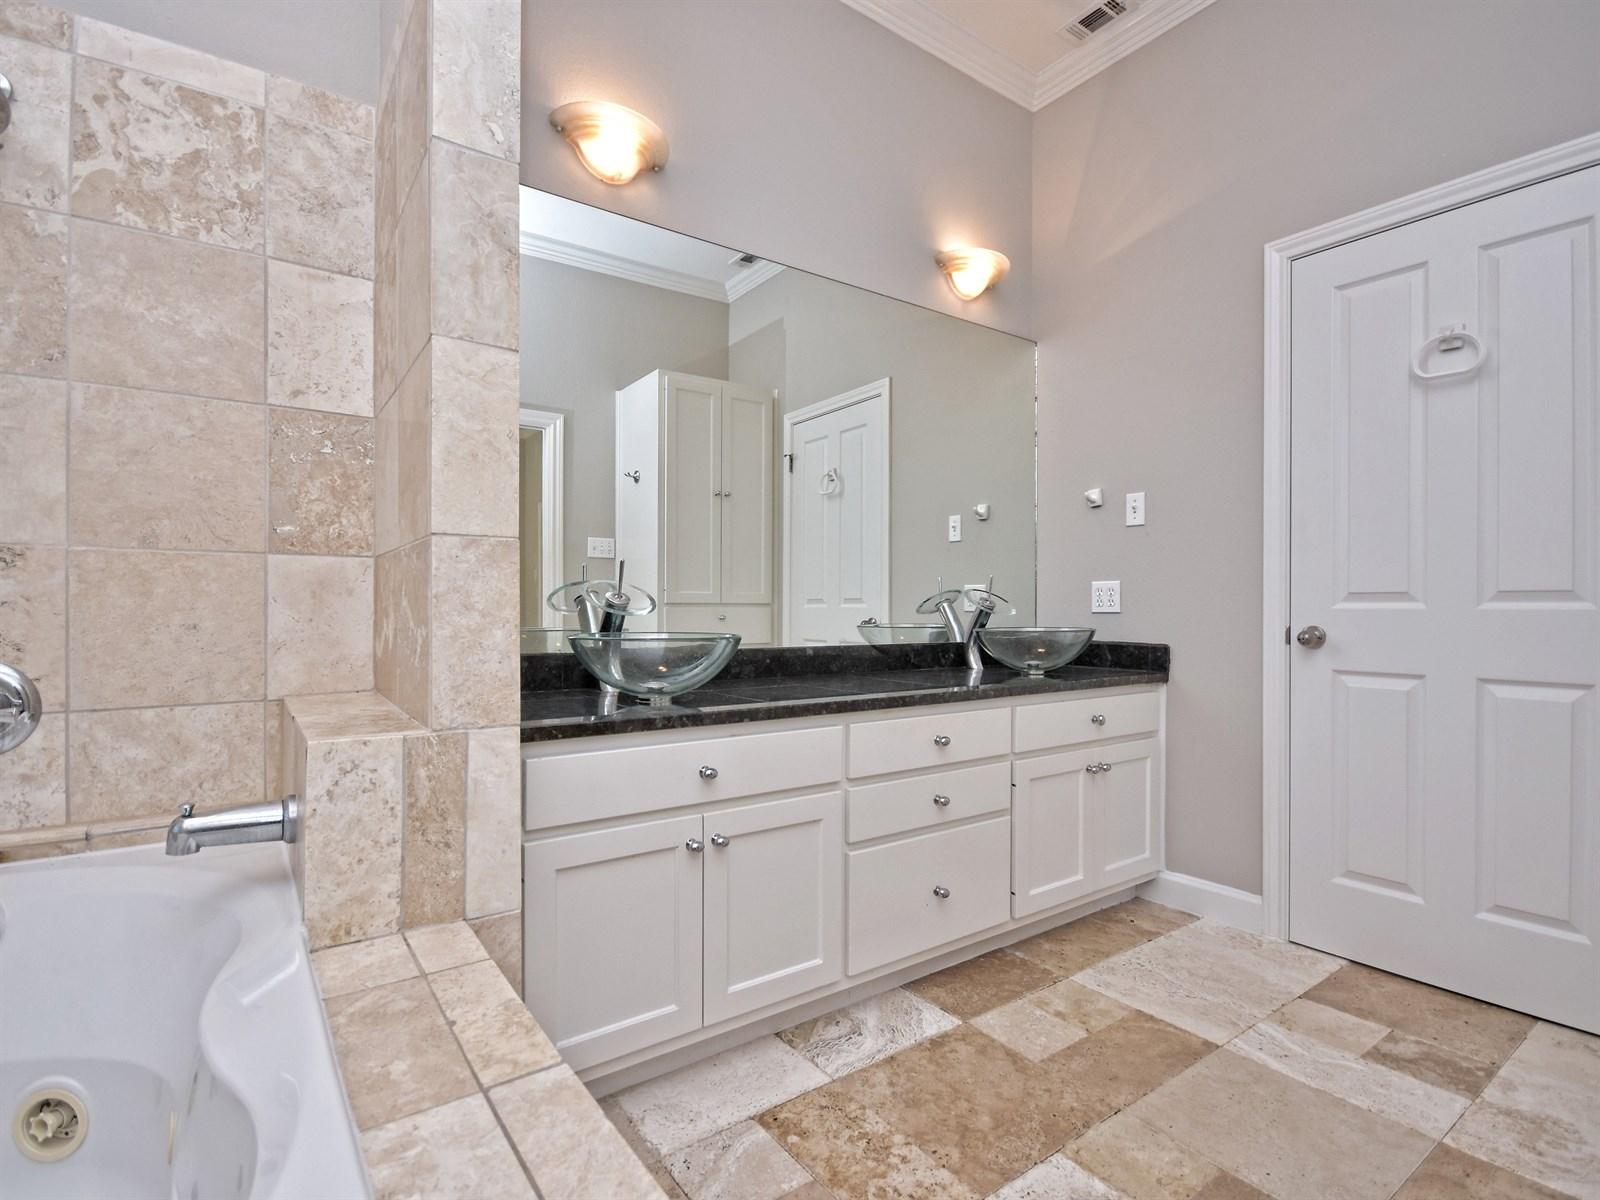 708 Bermuda Dr Lakeway TX | Lakeway Home for Sale | Lori Wakefield REALTOR | Keller Williams Lake Travis